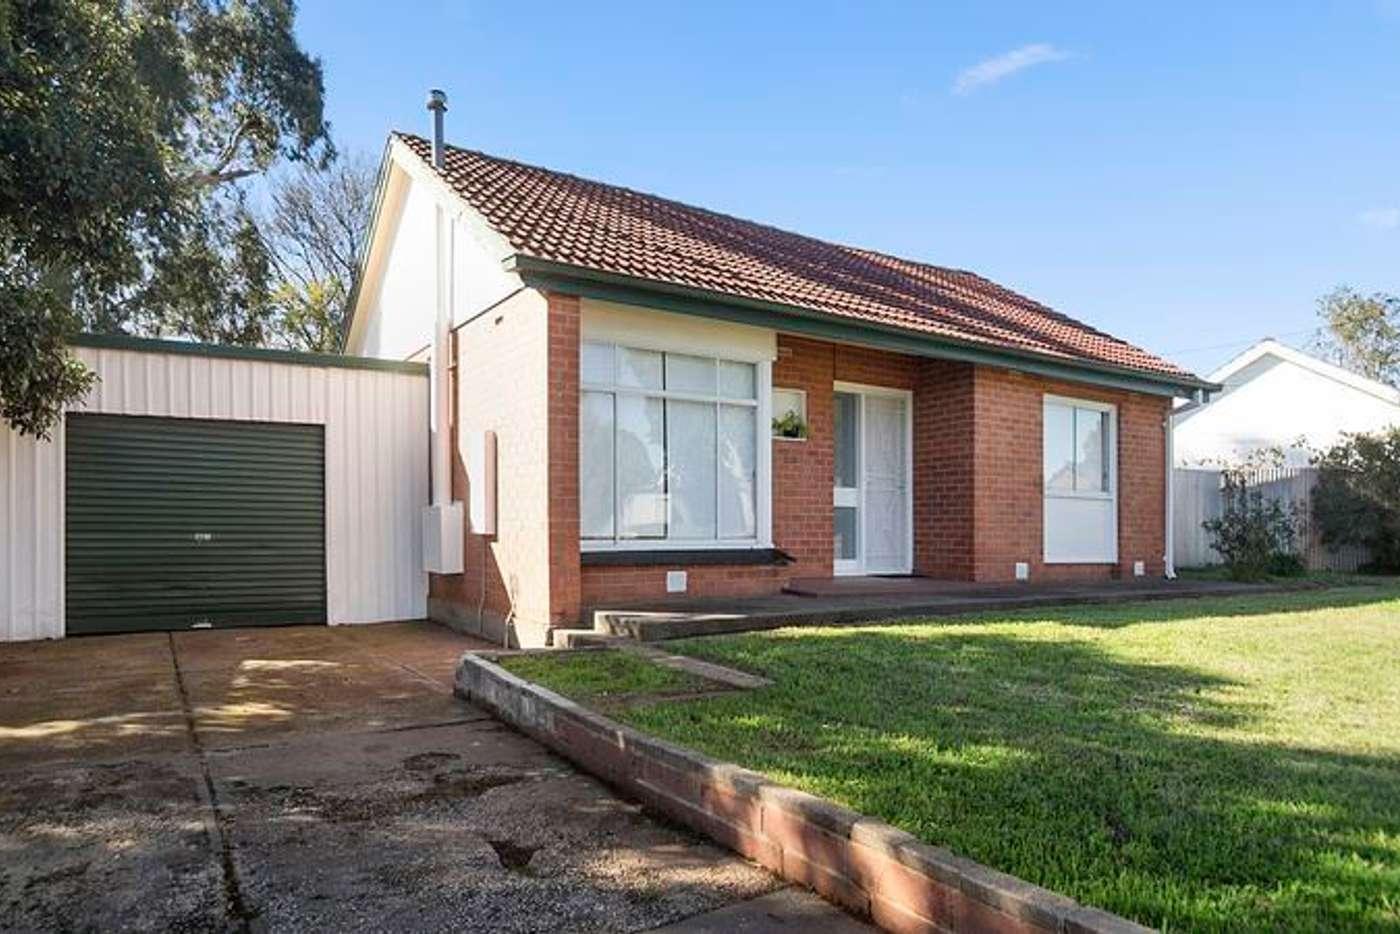 Main view of Homely house listing, 40 Ashton Road, Davoren Park SA 5113